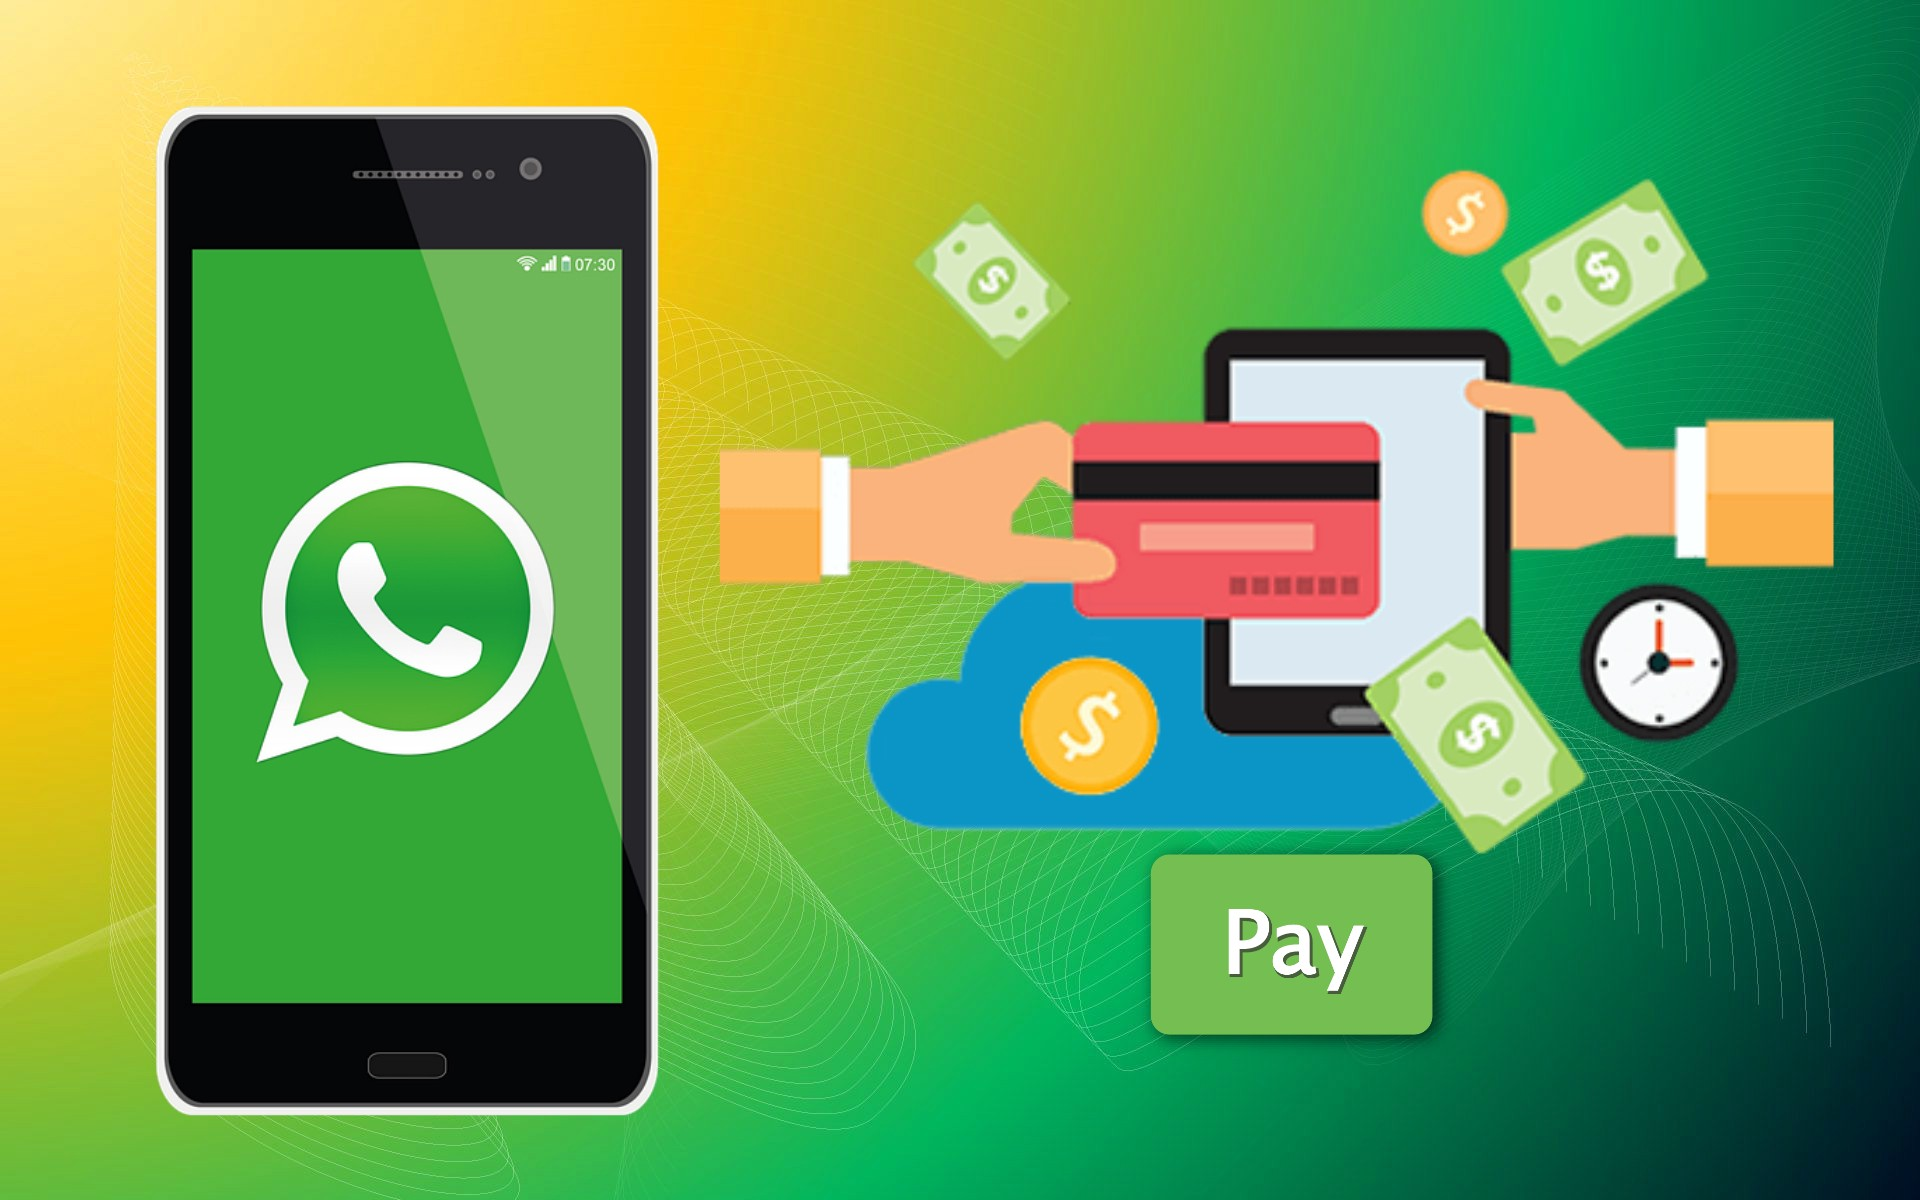 Whatsapp Mobil Ödeme